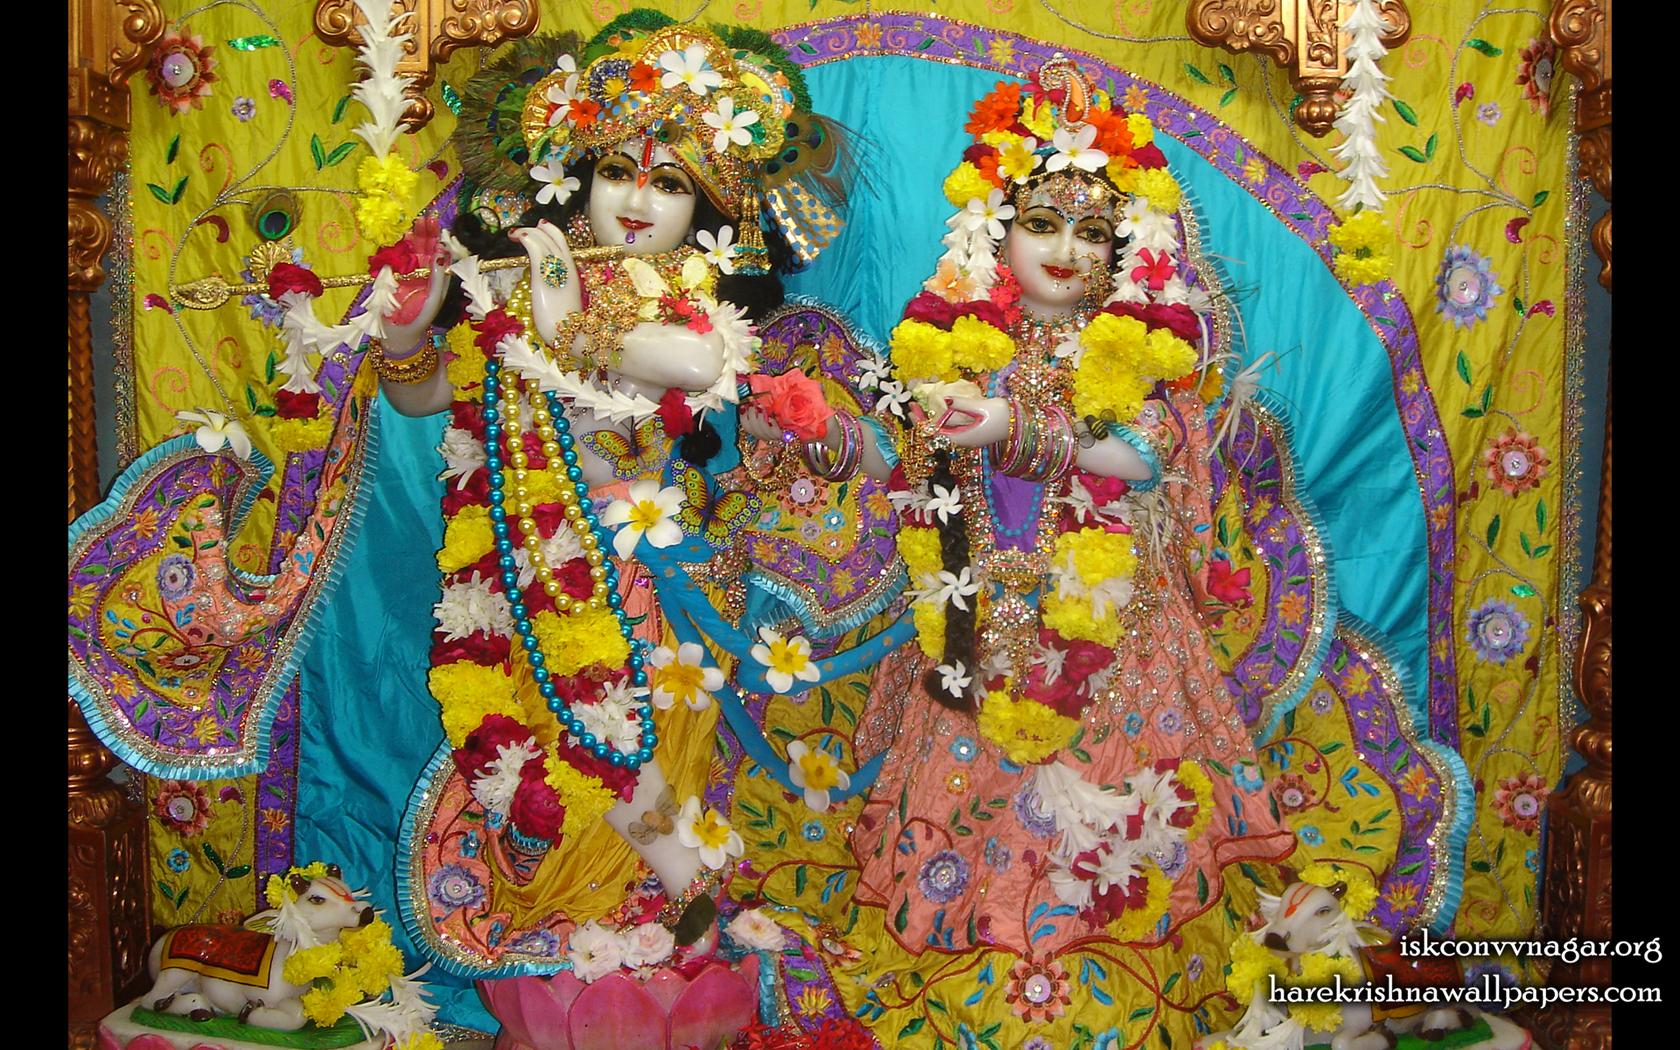 Sri Sri Radha Giridhari Wallpaper (033) Size 1680x1050 Download